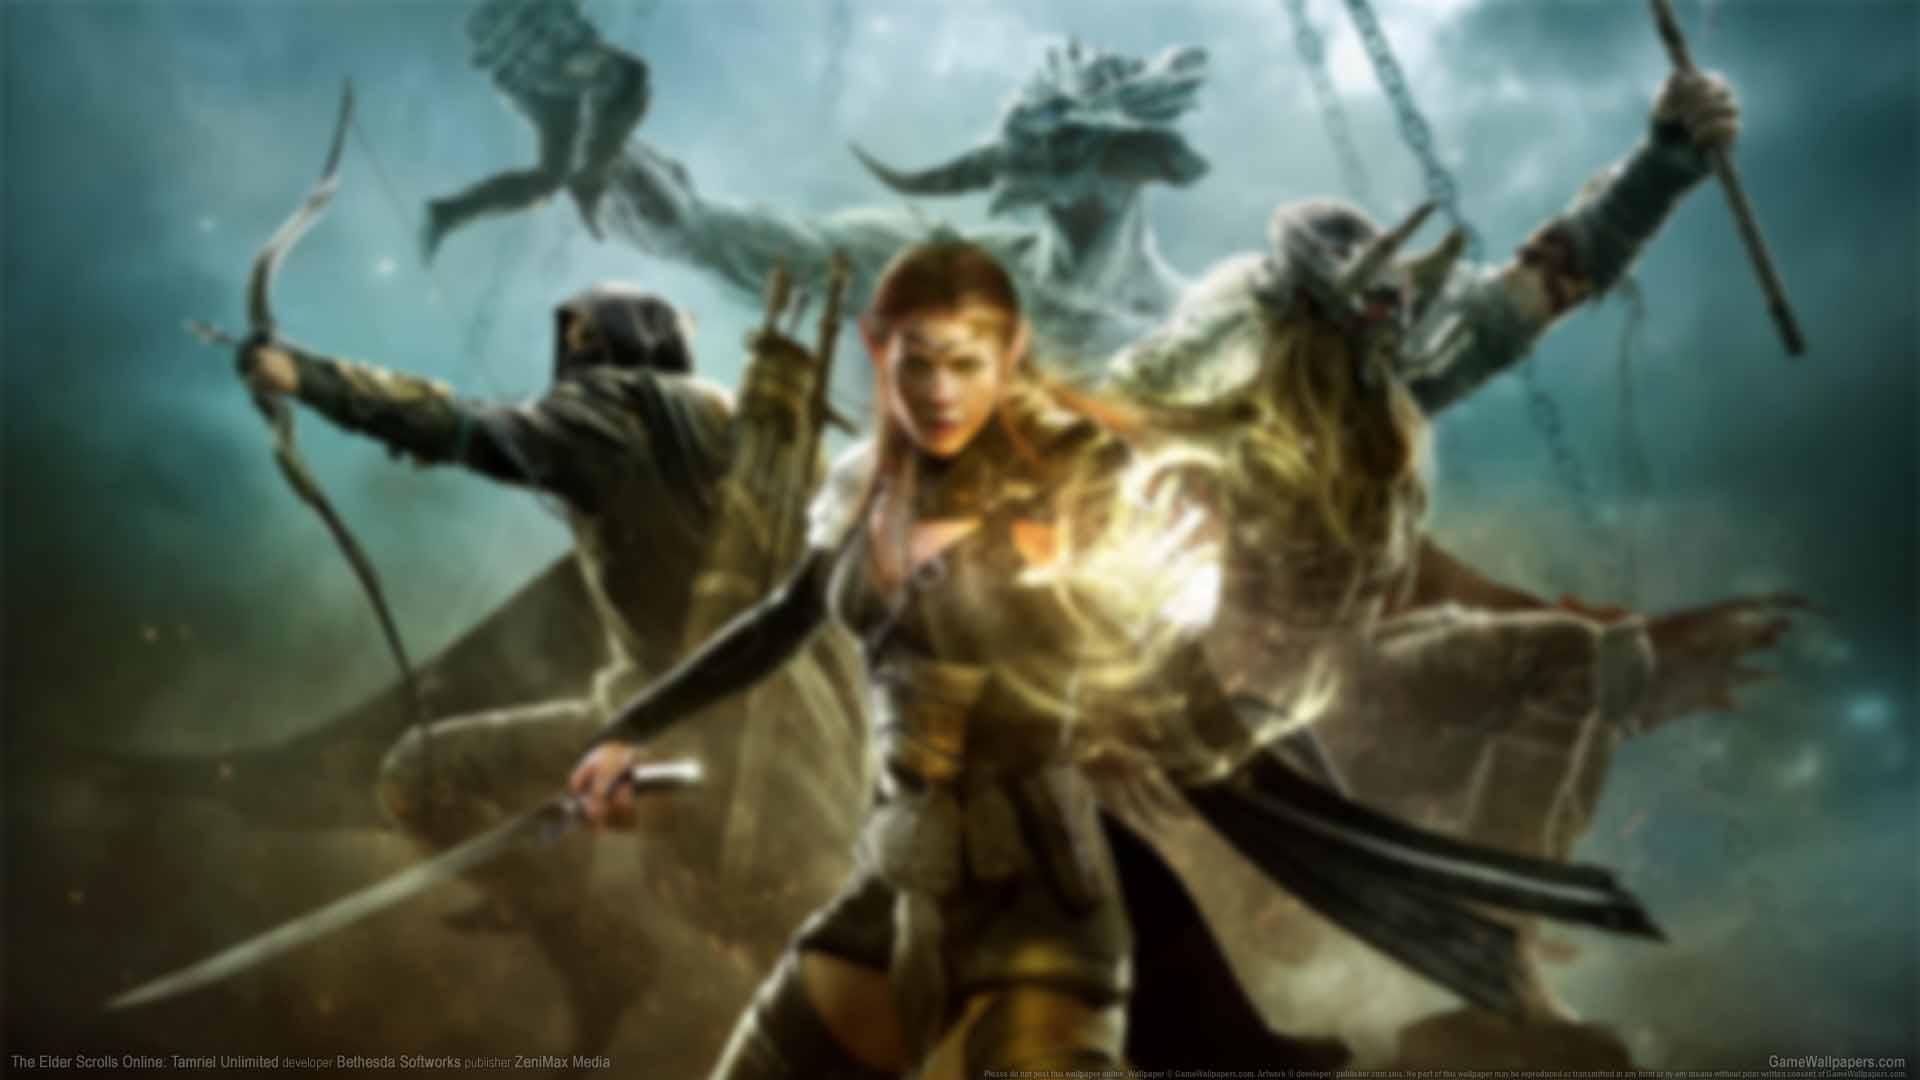 Download The Elder Scrolls Online Tamriel Unlimited